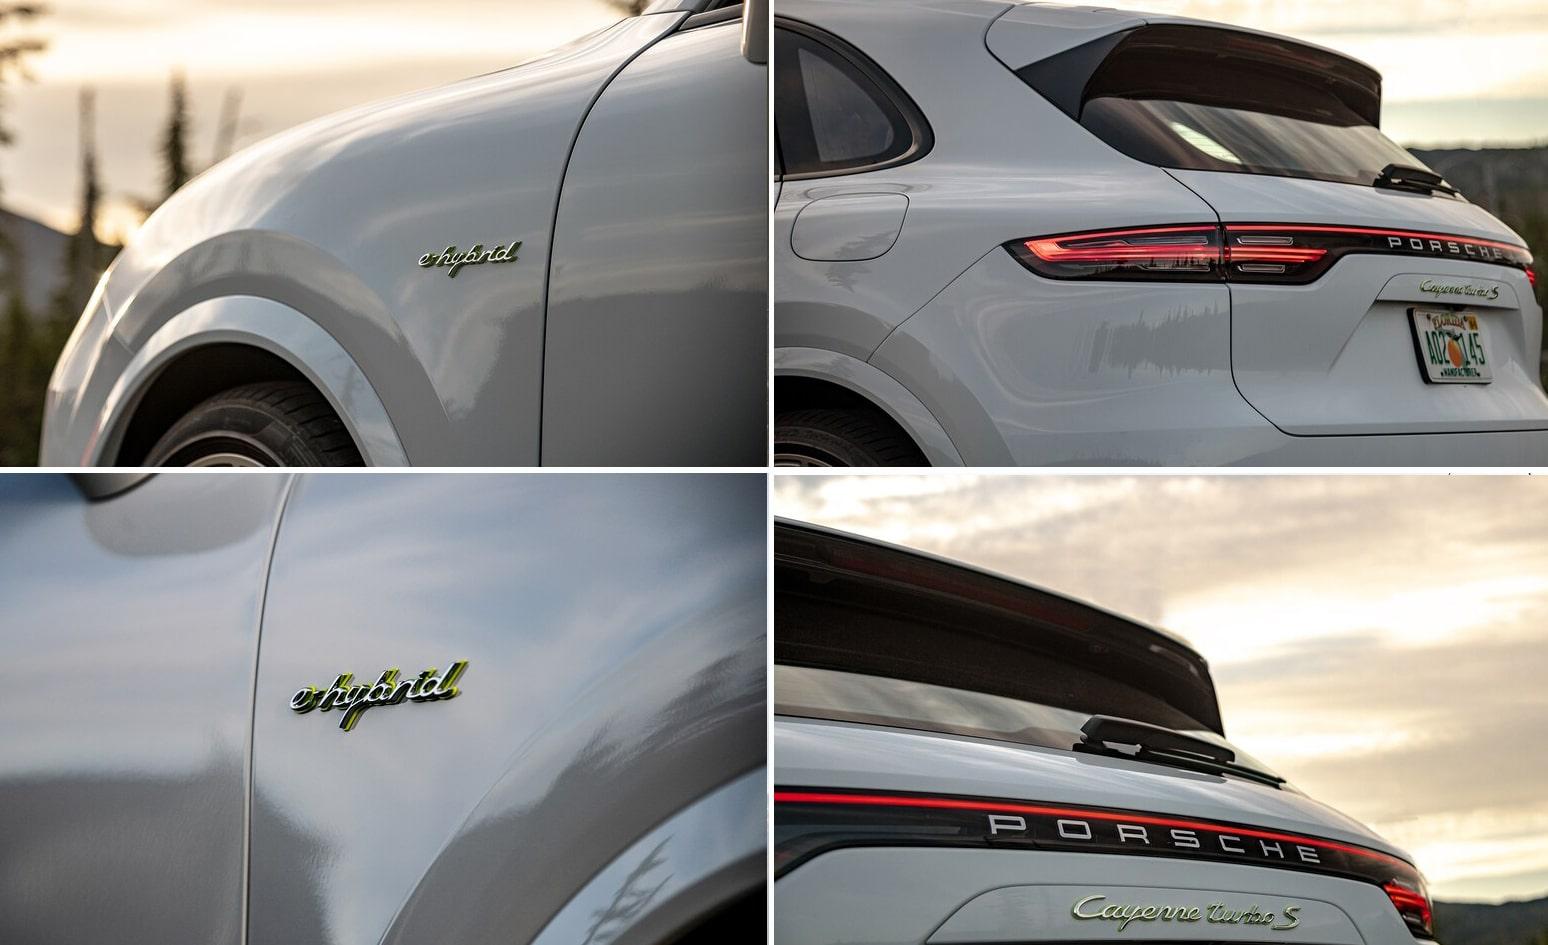 2019-porsche-cayenne-turbo-s-e-hybrid-drive(1)-min